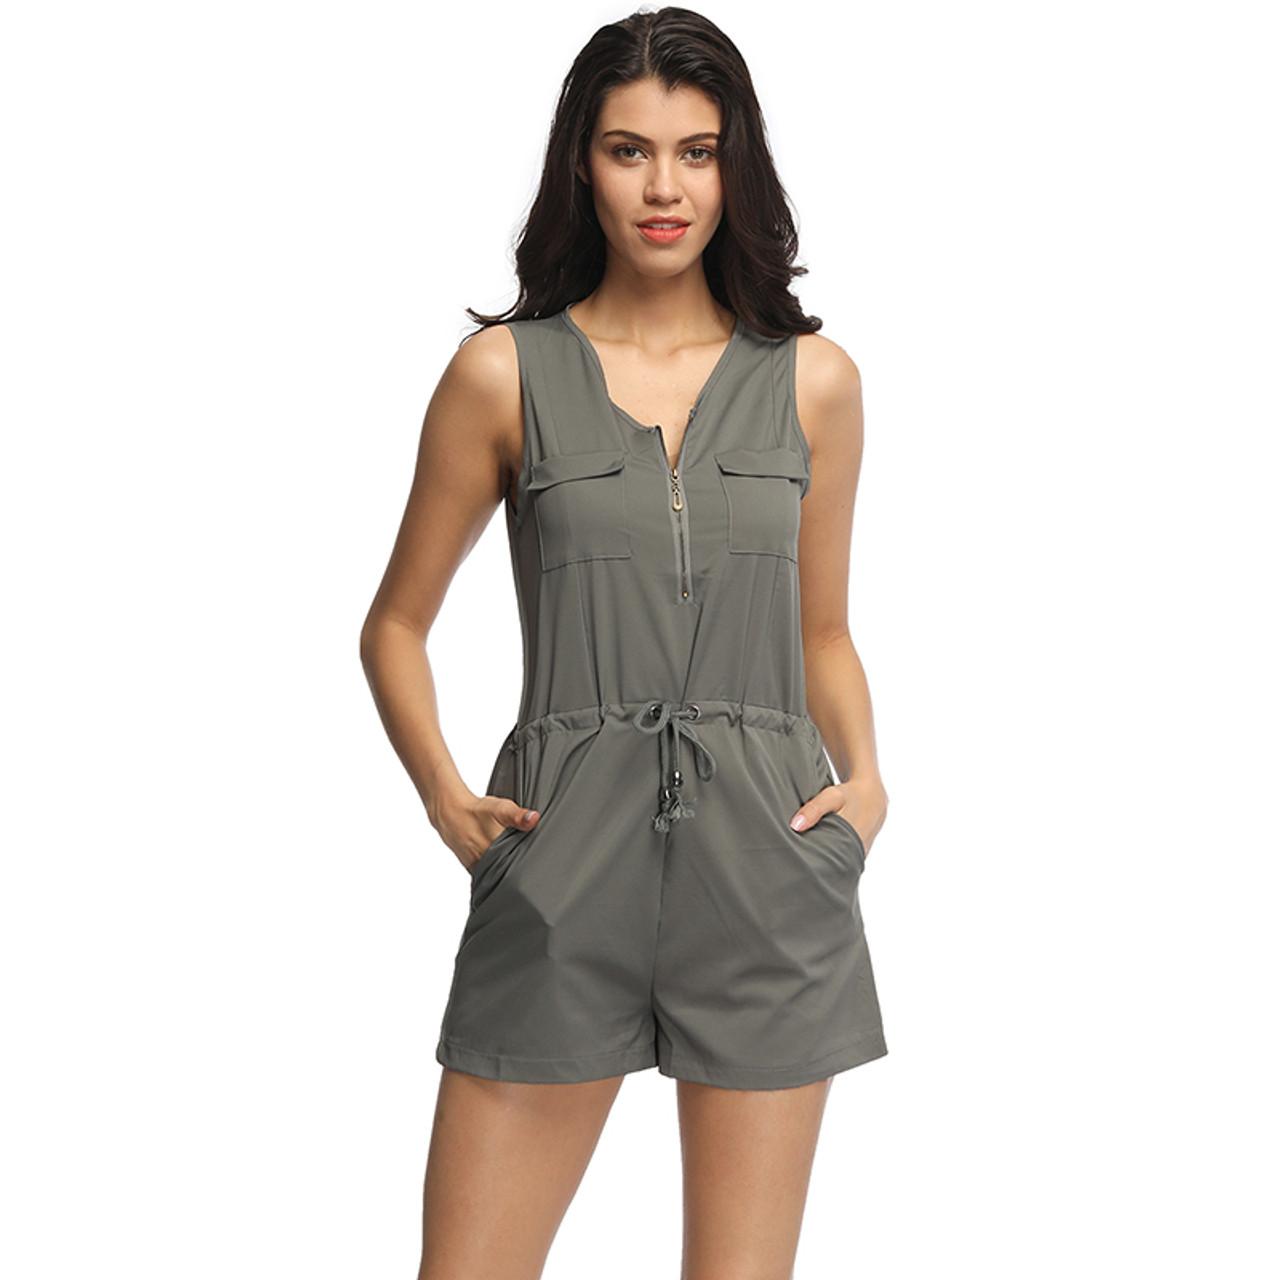 3a9735e1c296 ... Sexy Sleeveless Bodysuit Women Jumpsuit Shorts Romper Summer V-neck  Zipper Pockets Playsuit Fashion Beach ...